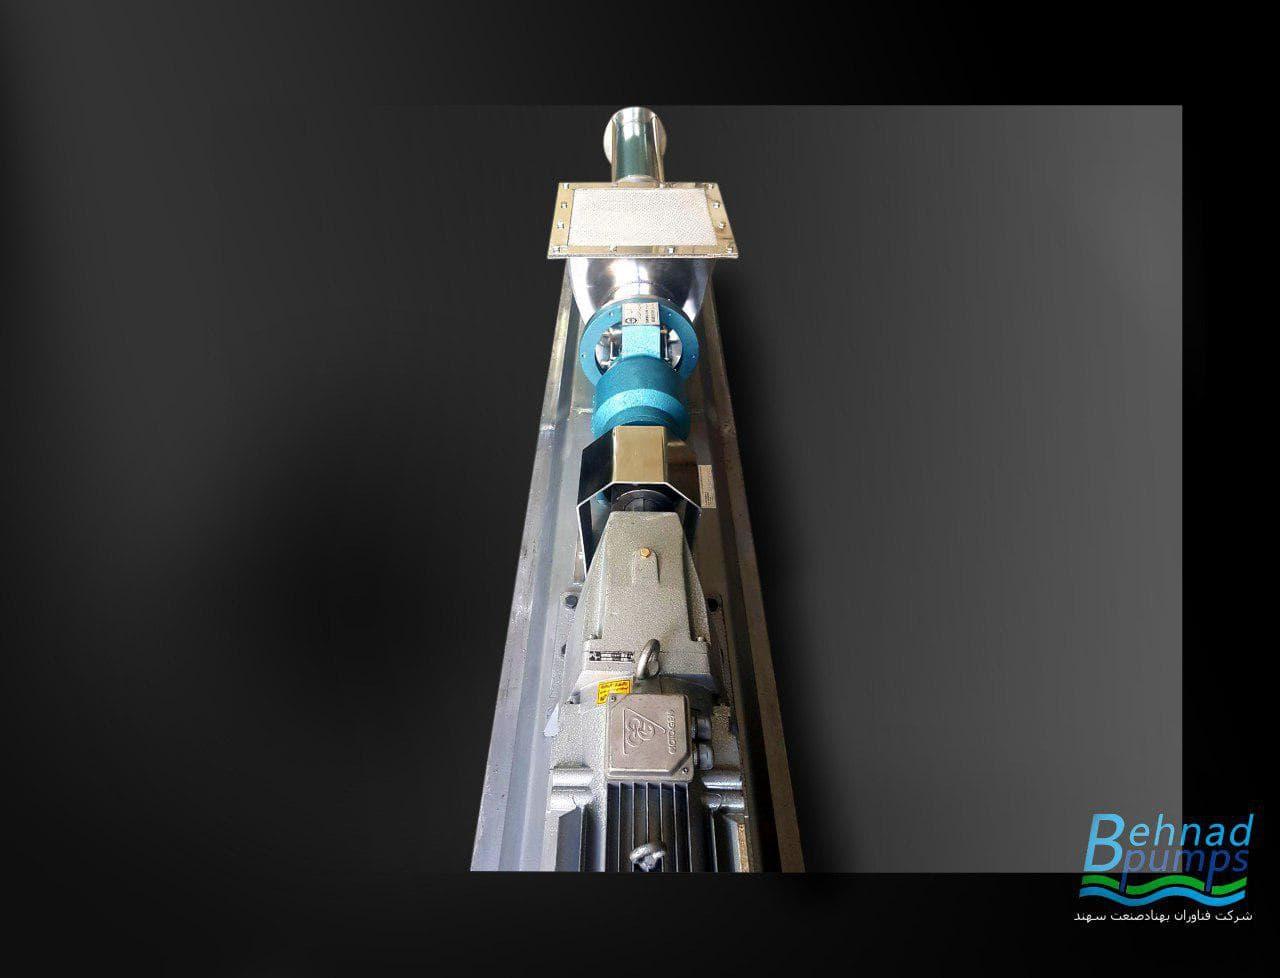 مونو پمپ بهناد جهت انتقال شکلات , مونو پمپ بهناد جهت انتقال سس, مونو پمپ بهناد جهت انتقال رب, مونو پمپ,فناوران بهناد صنعت سهند,behnad pumps,روتور,استاتور,بهناد پمپ